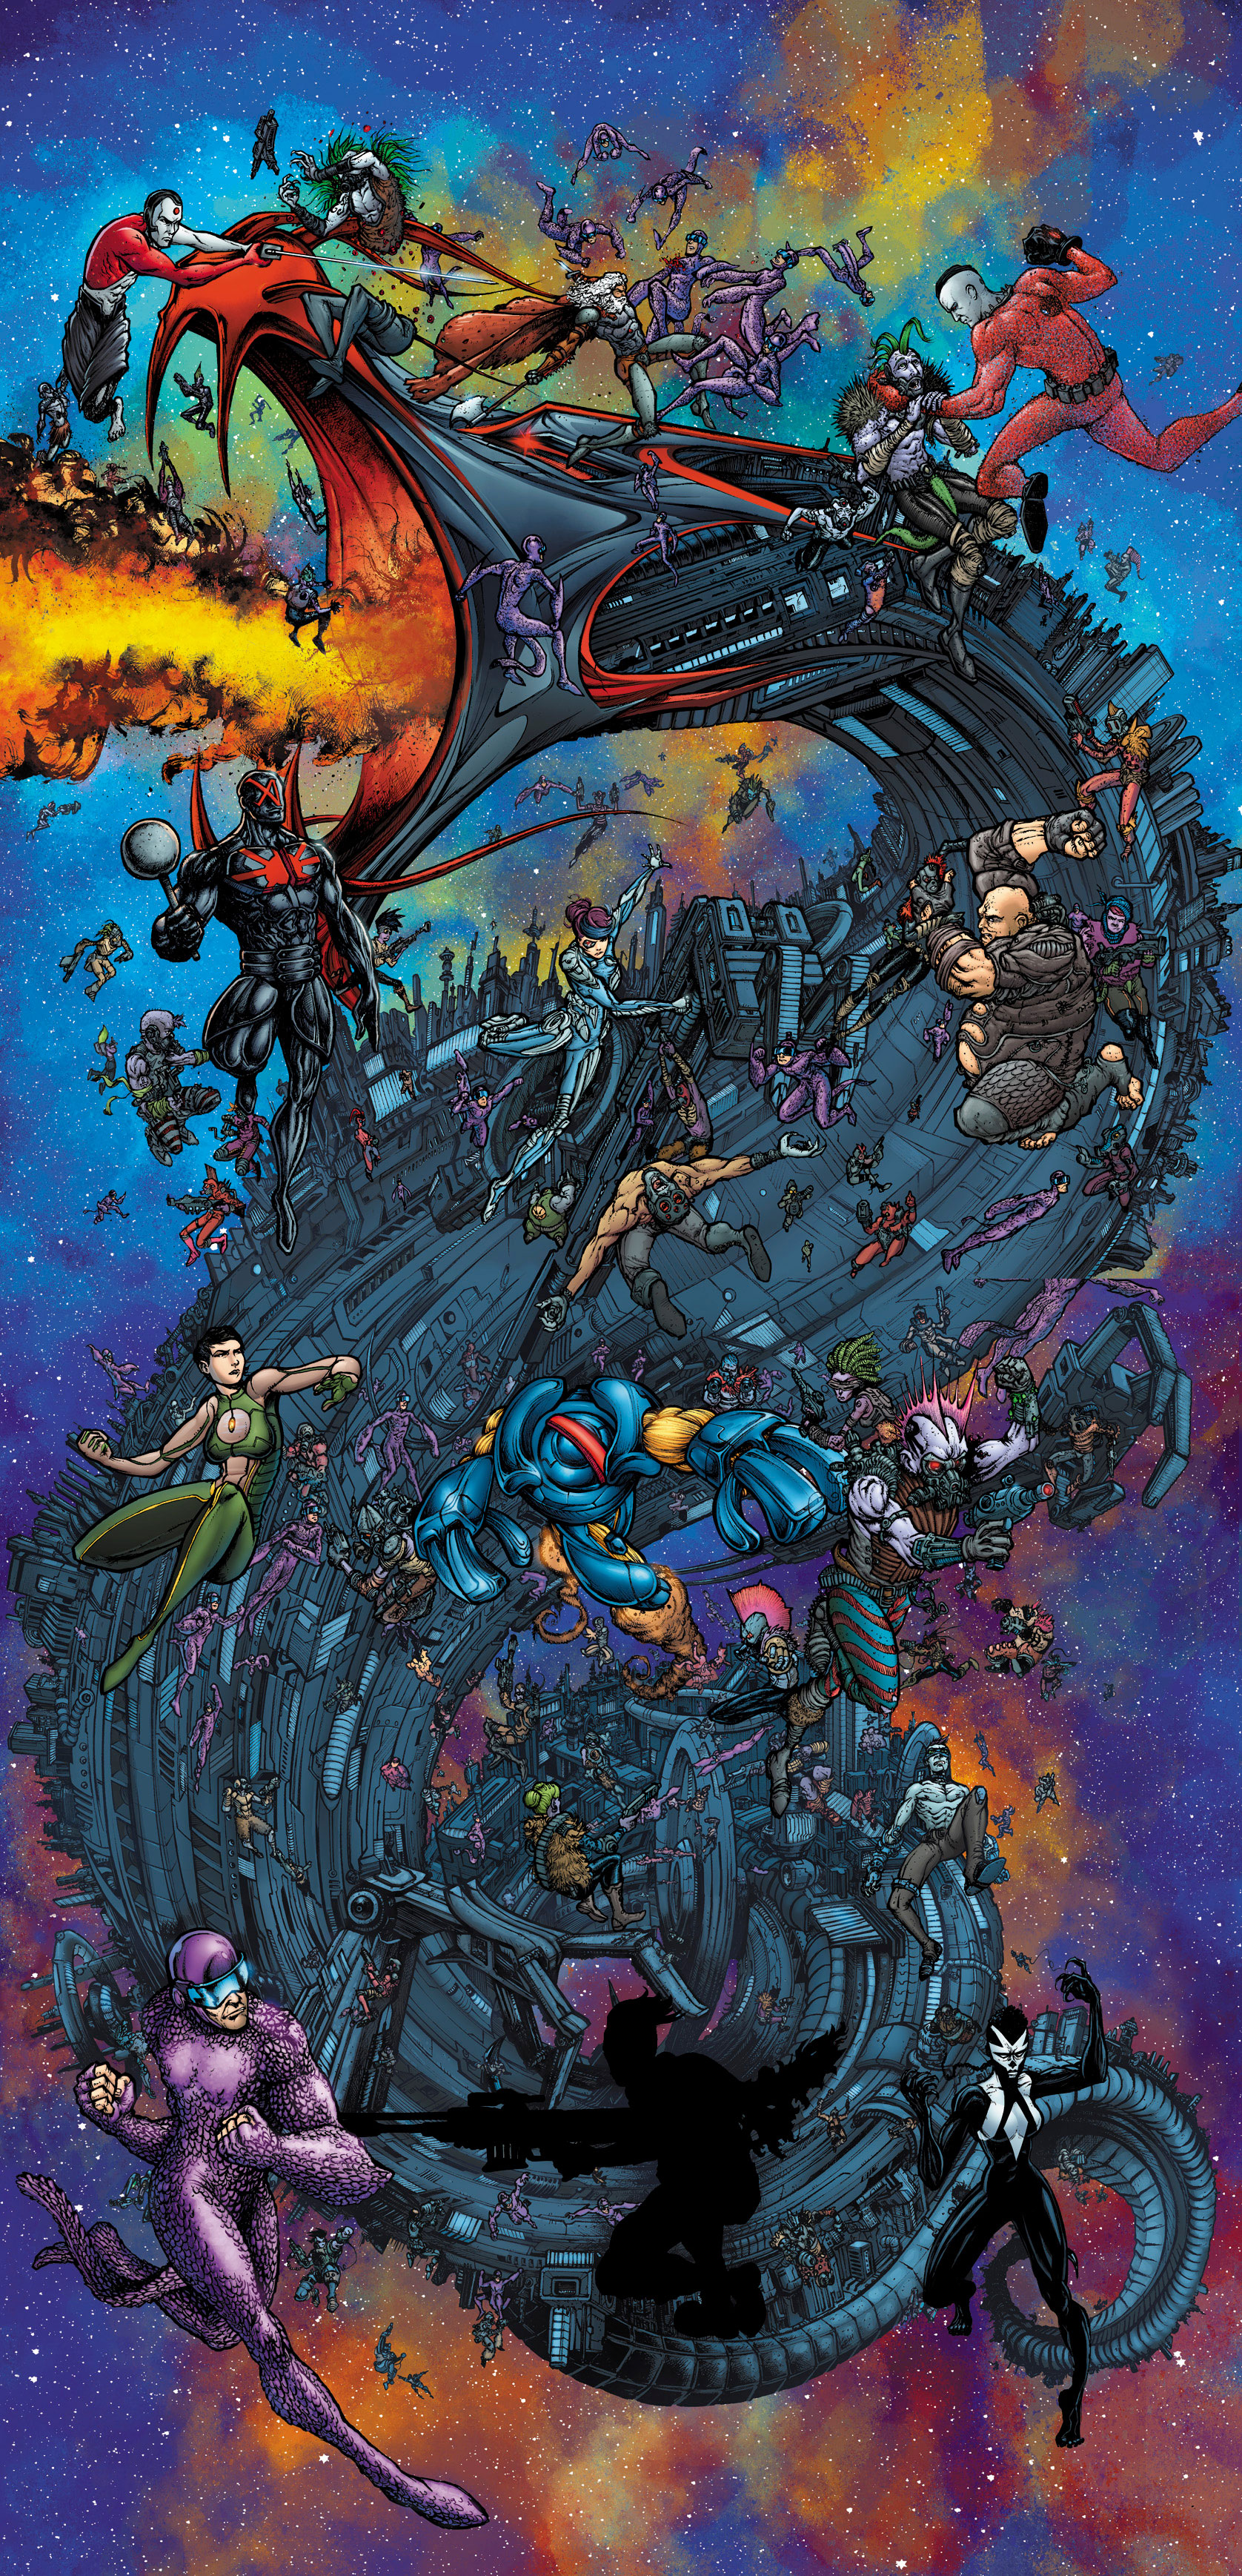 4001 A.D. Mega Cover– Art by Ryan Lee